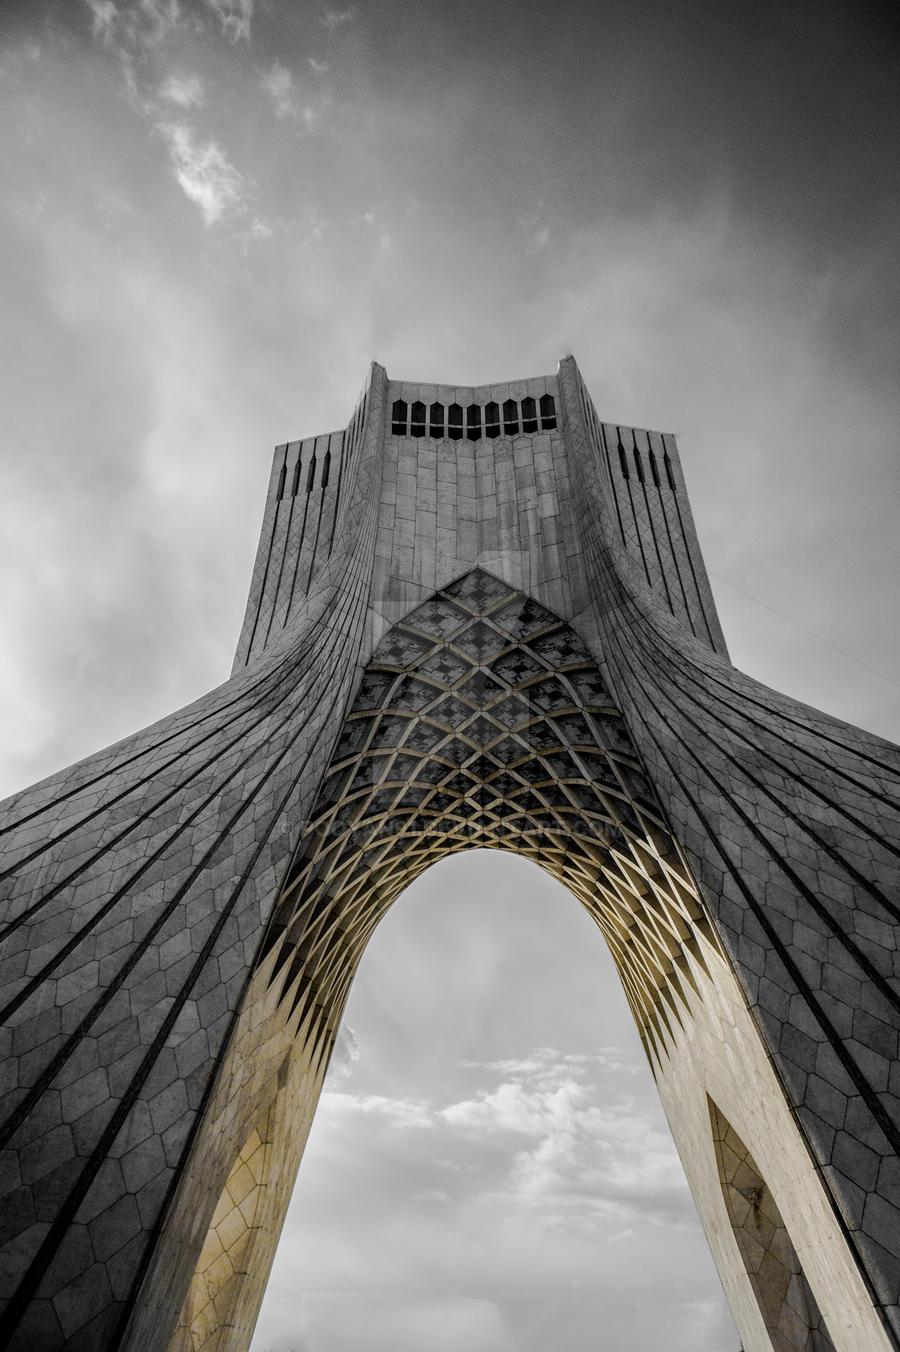 Tehran,Iran (With images) | Tehran iran, Night city, Tehran |University Tehran Wallpaper